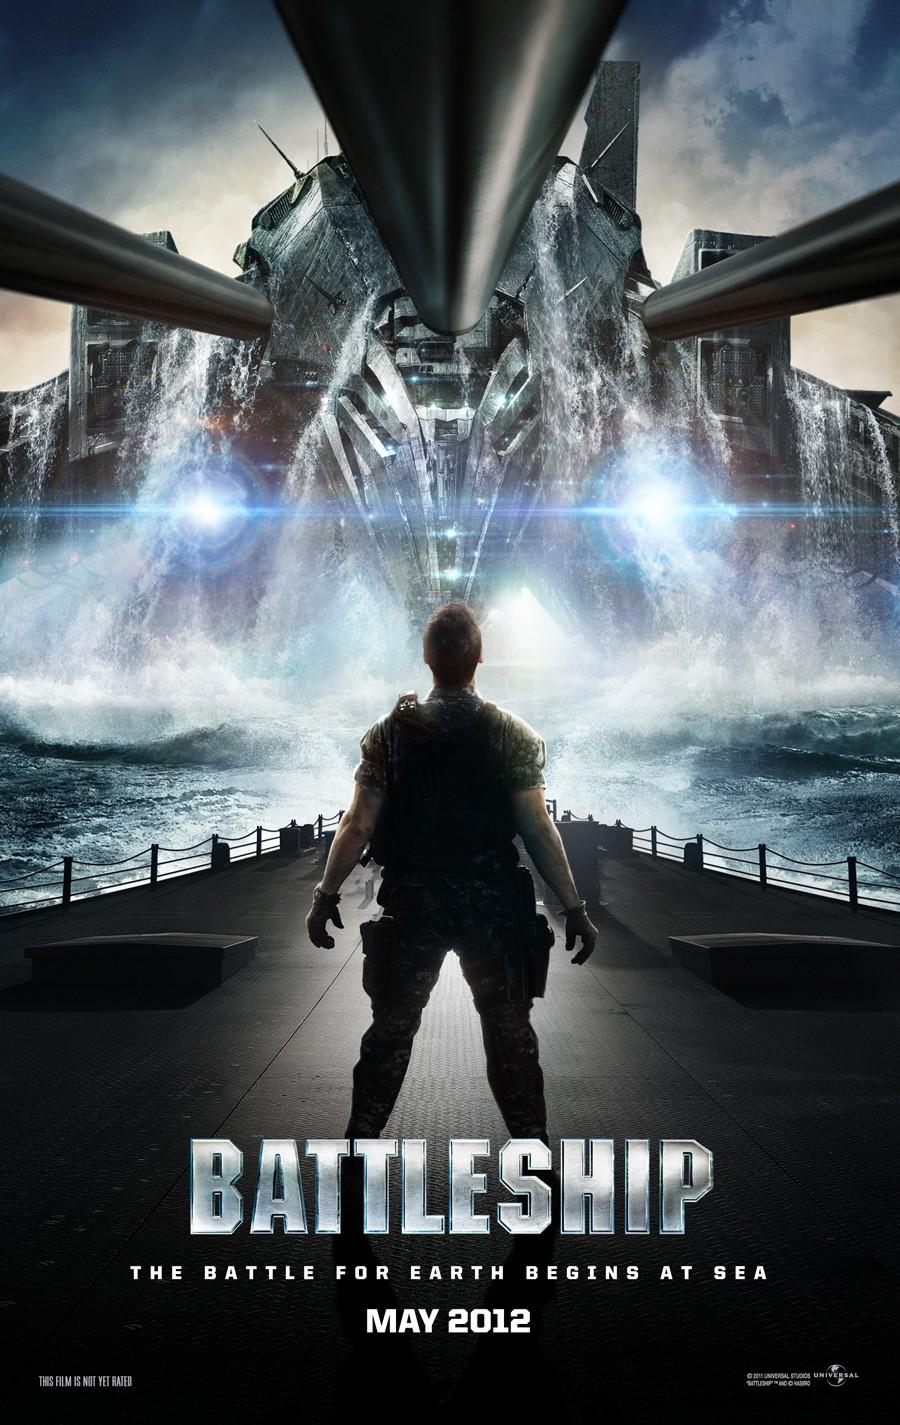 http//st.kinopoisk.ru/im/poster/1/7/5/kinopoisk.ru-Battleship-1753943.jpg